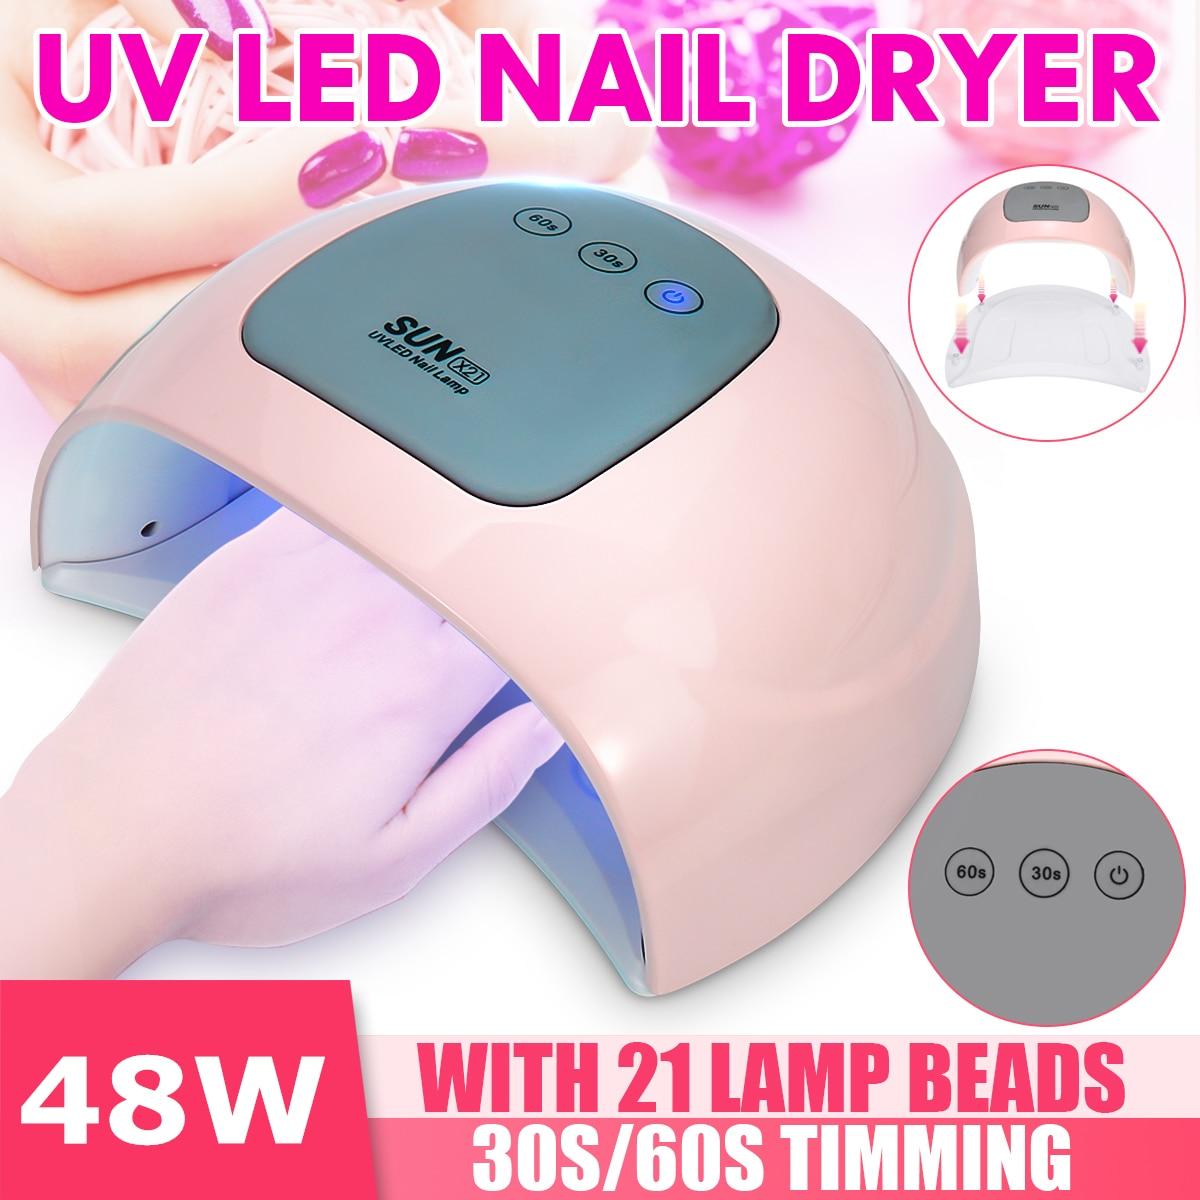 36/48W Nail Dryer Fast Speed Gel Light Nail Lamp LED UV Lamps For All Kinds Of Gel Nail Art Care Sanding Buffer